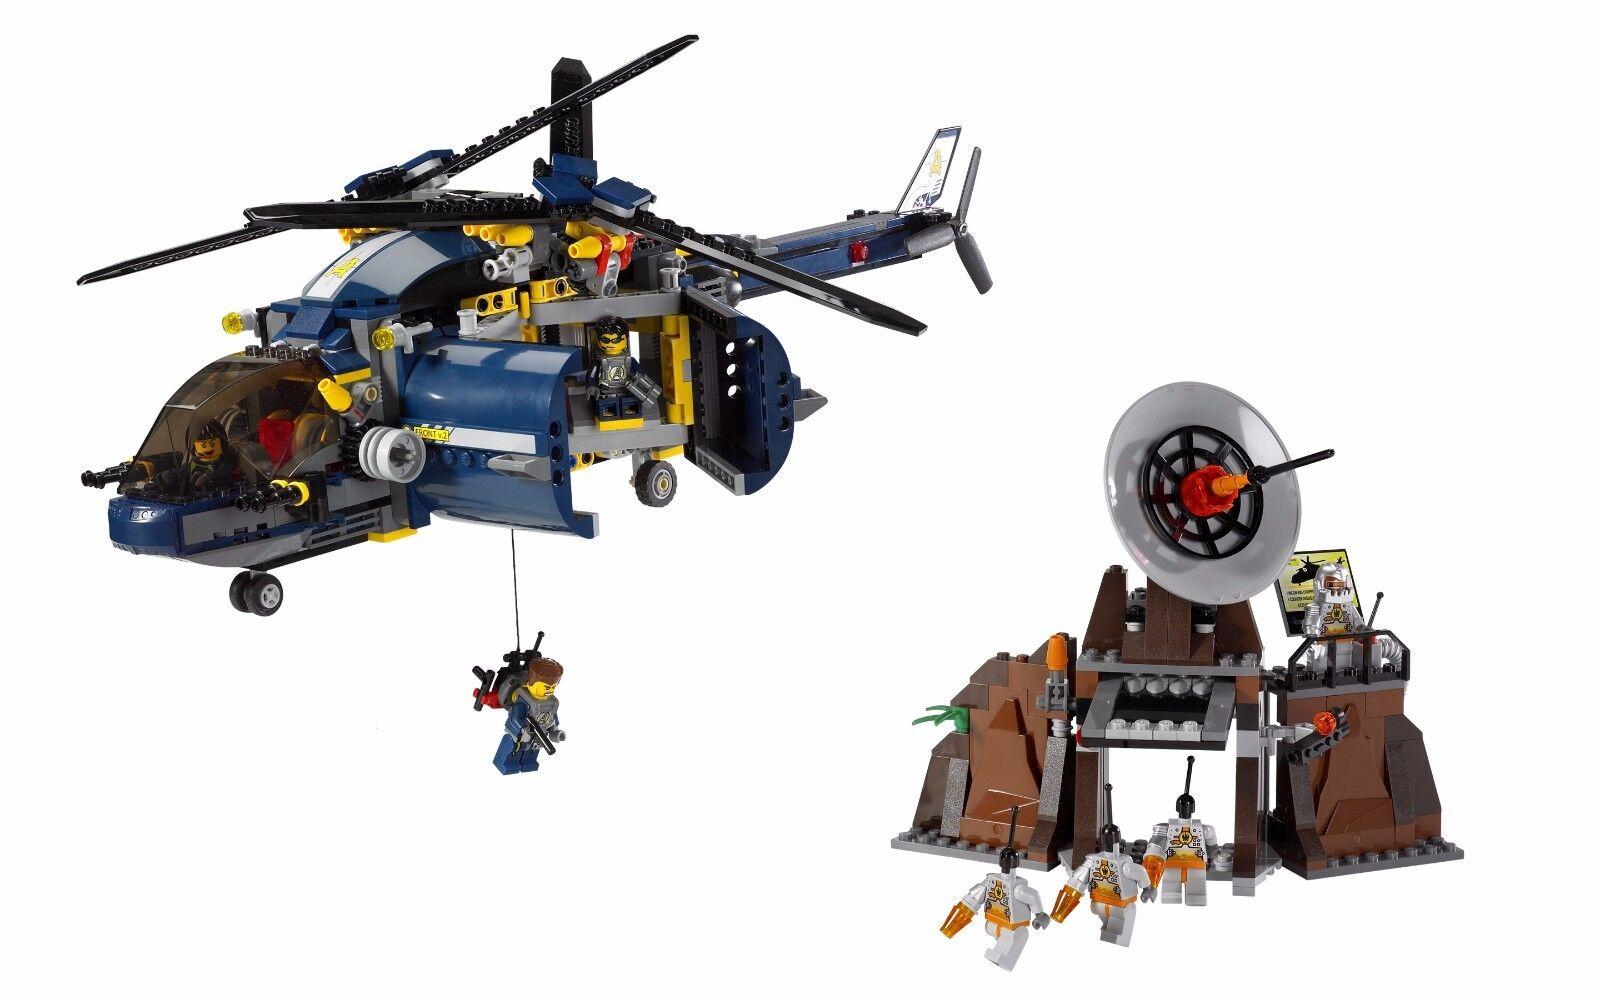 LEGO Agents 8971 Aerial Defense Unit 100% Complete w/ Manual & Minifigures